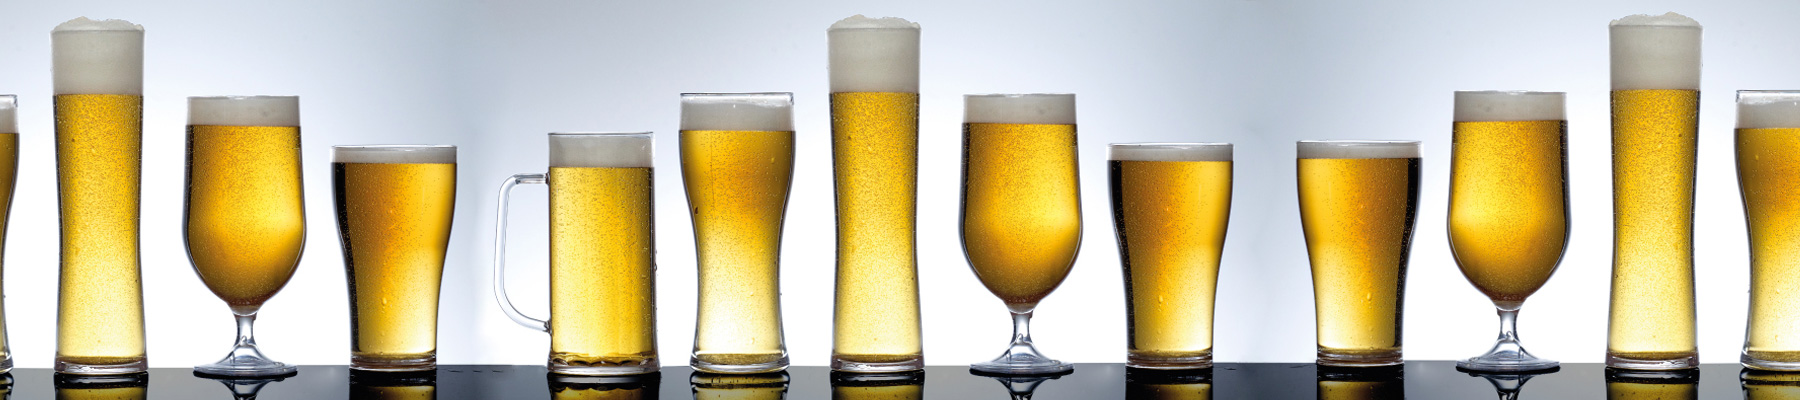 Plastic-Beer-Glasses-Hampshire